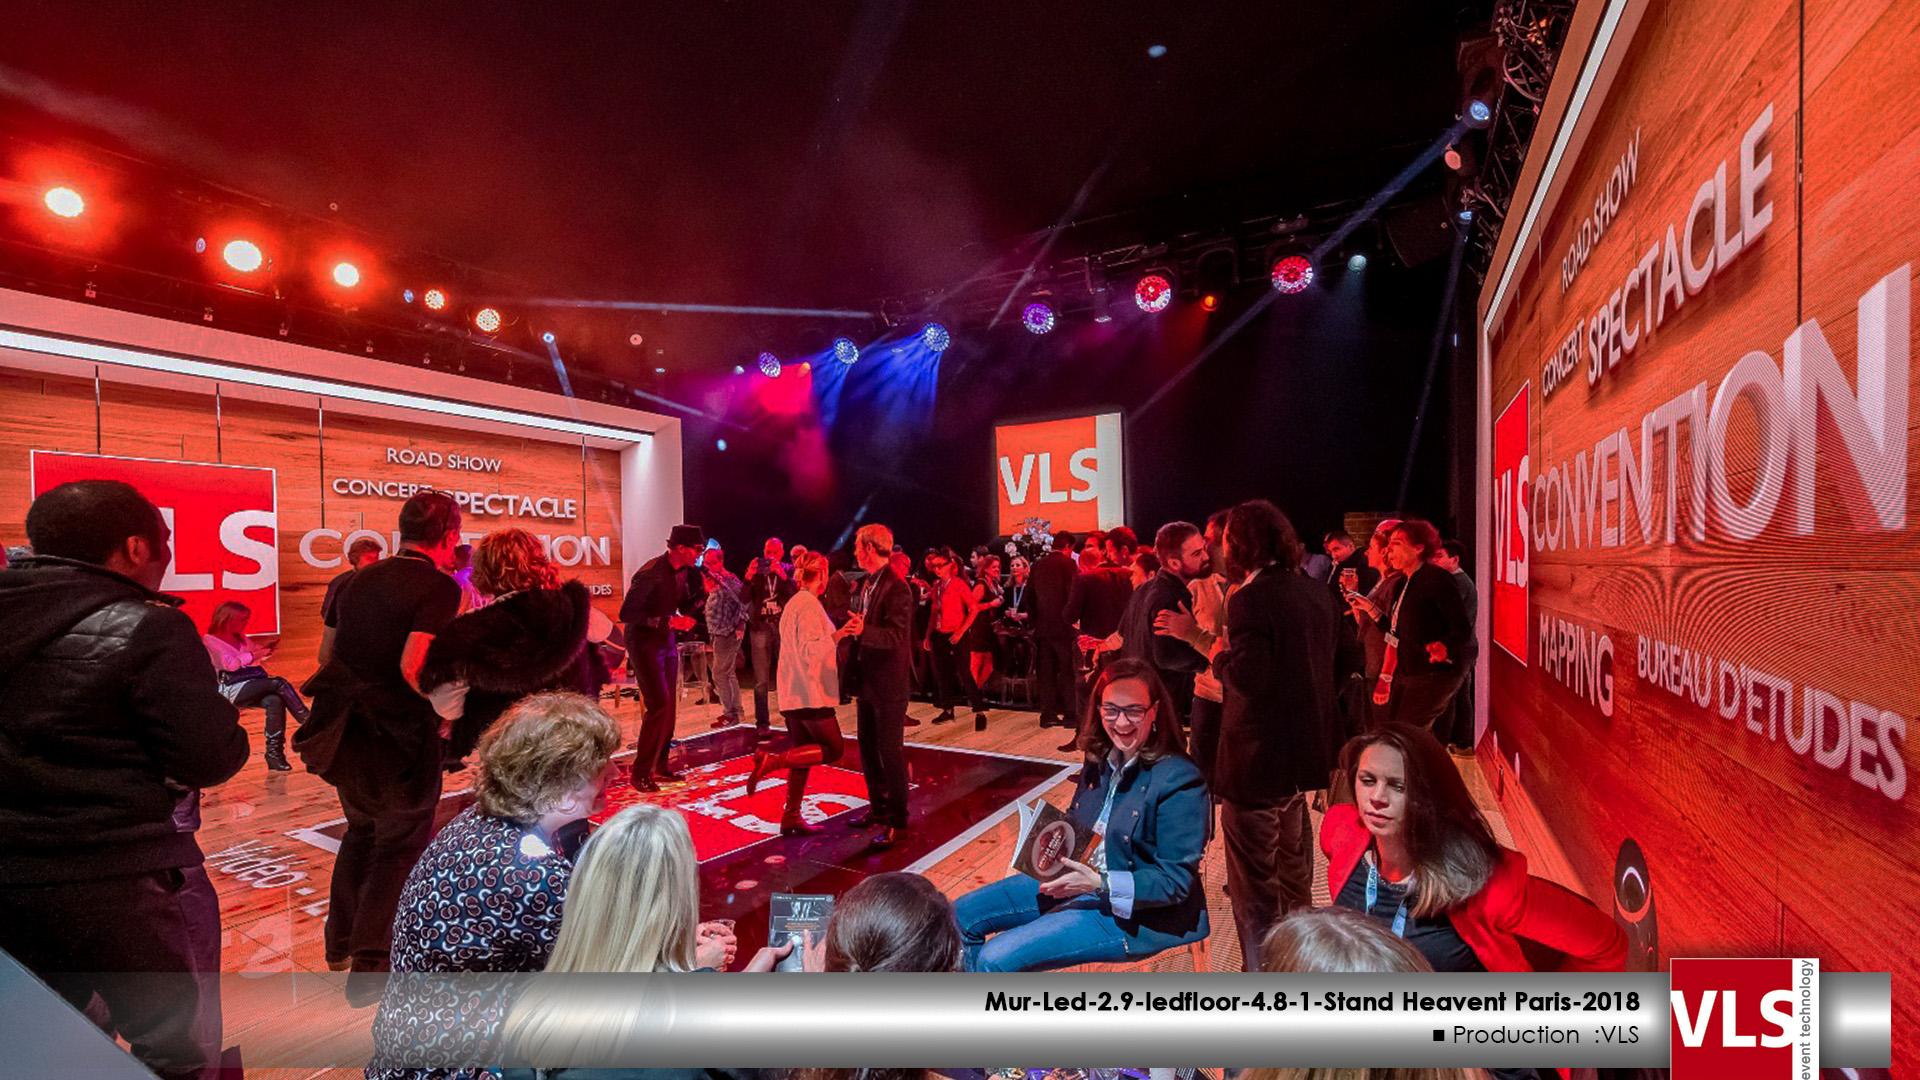 salon heavent 2018 stand VLS mur led immersif